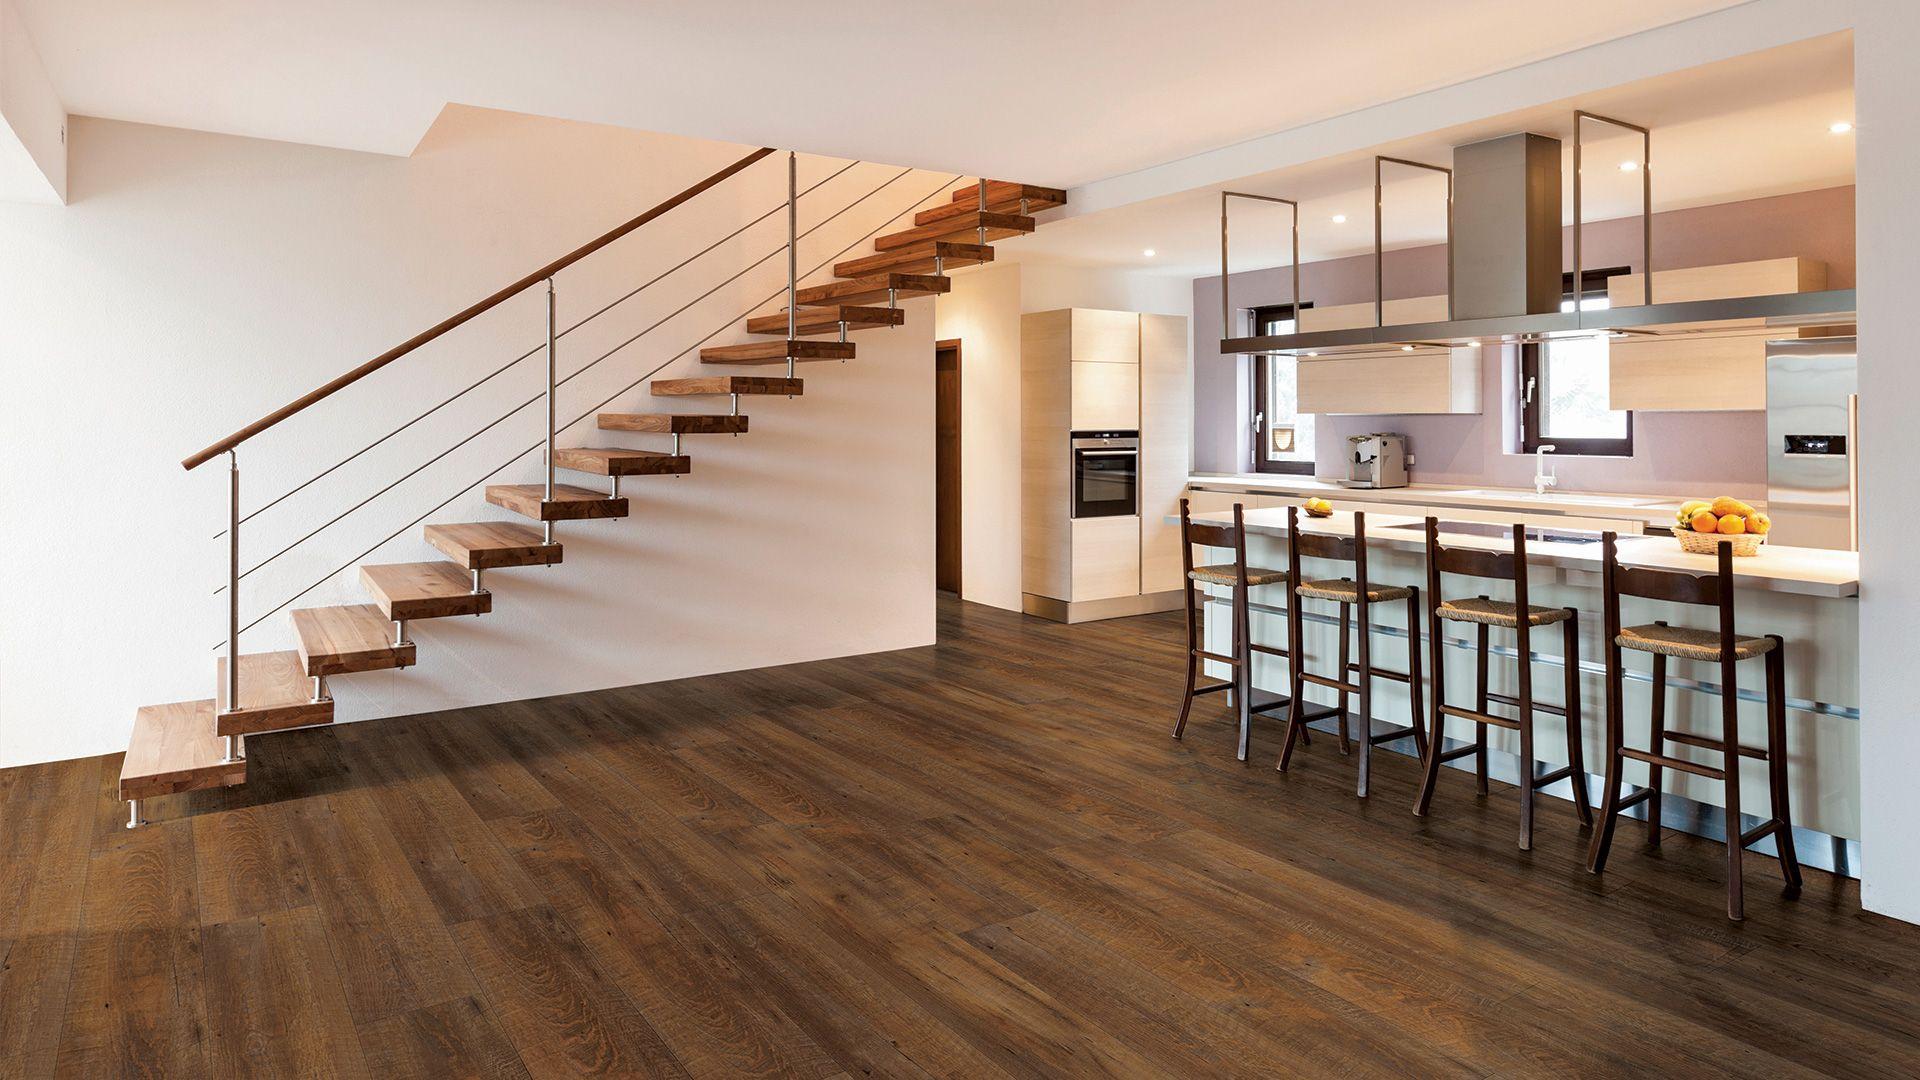 Coretec XL Montrose Oak 50LVP609 Coretec plus, Flooring